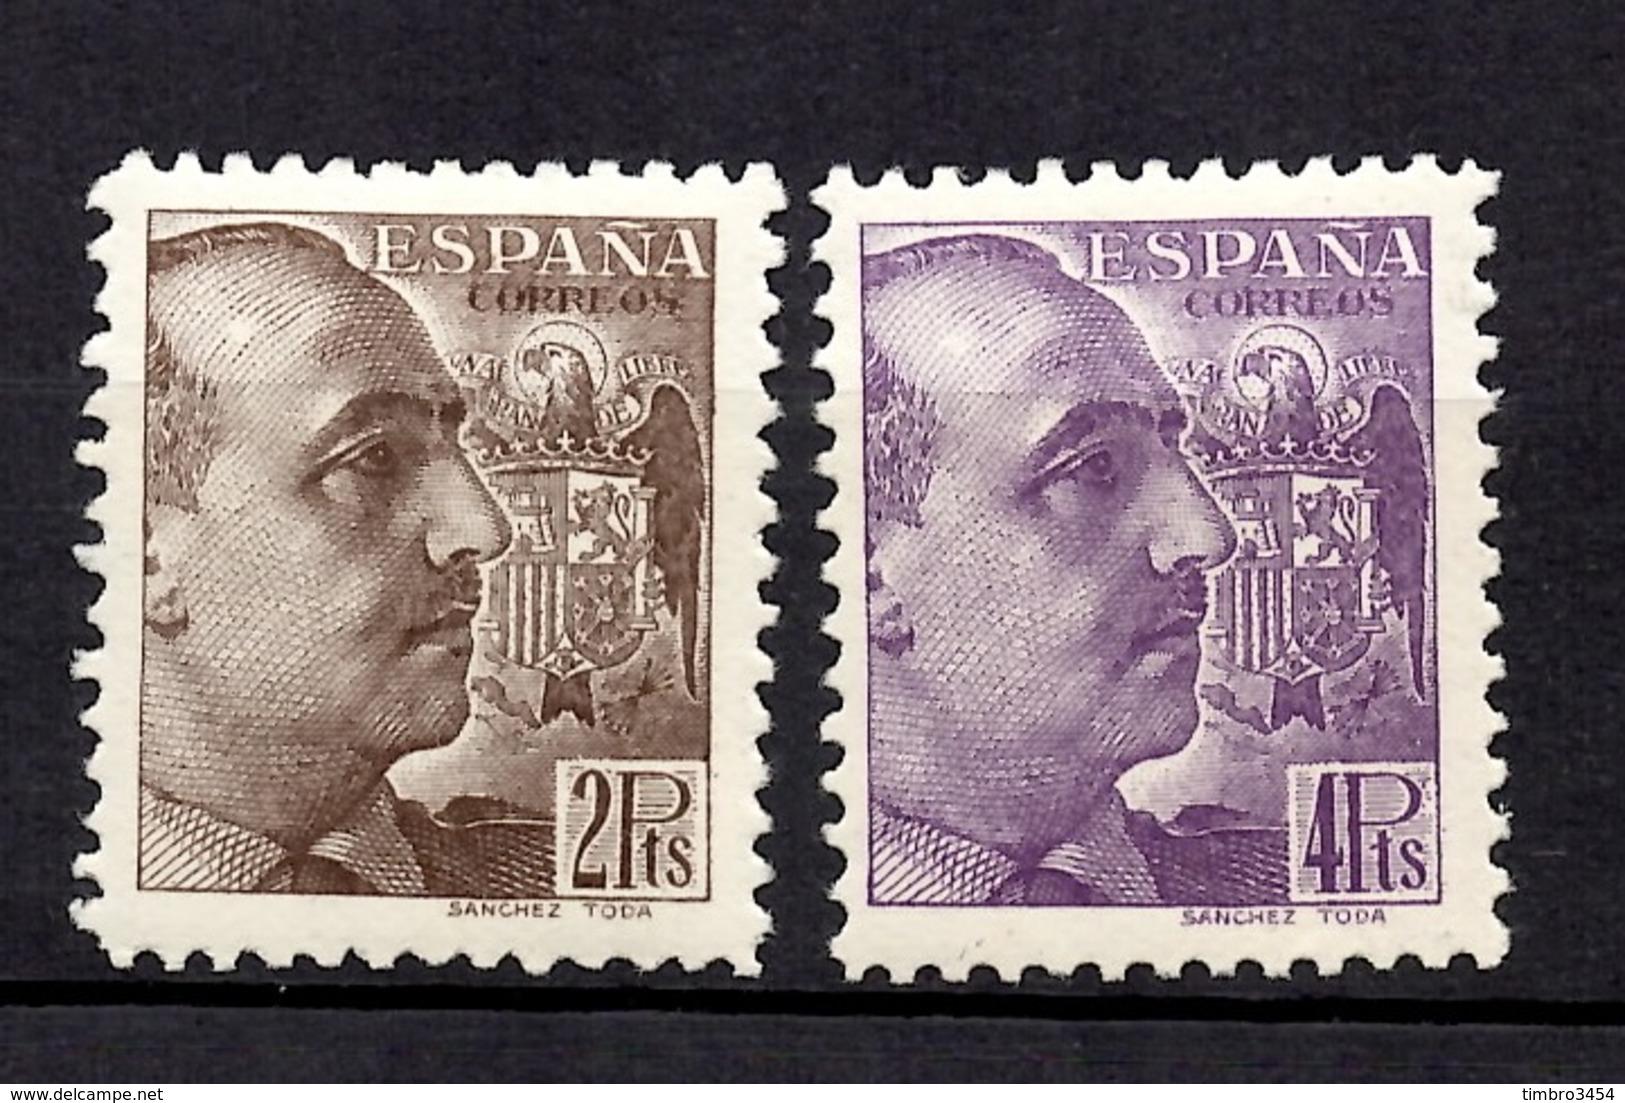 Espagne YT N° 673/674 Neufs *. Gomme D'origine. B/TB. A Saisir! - 1931-50 Neufs